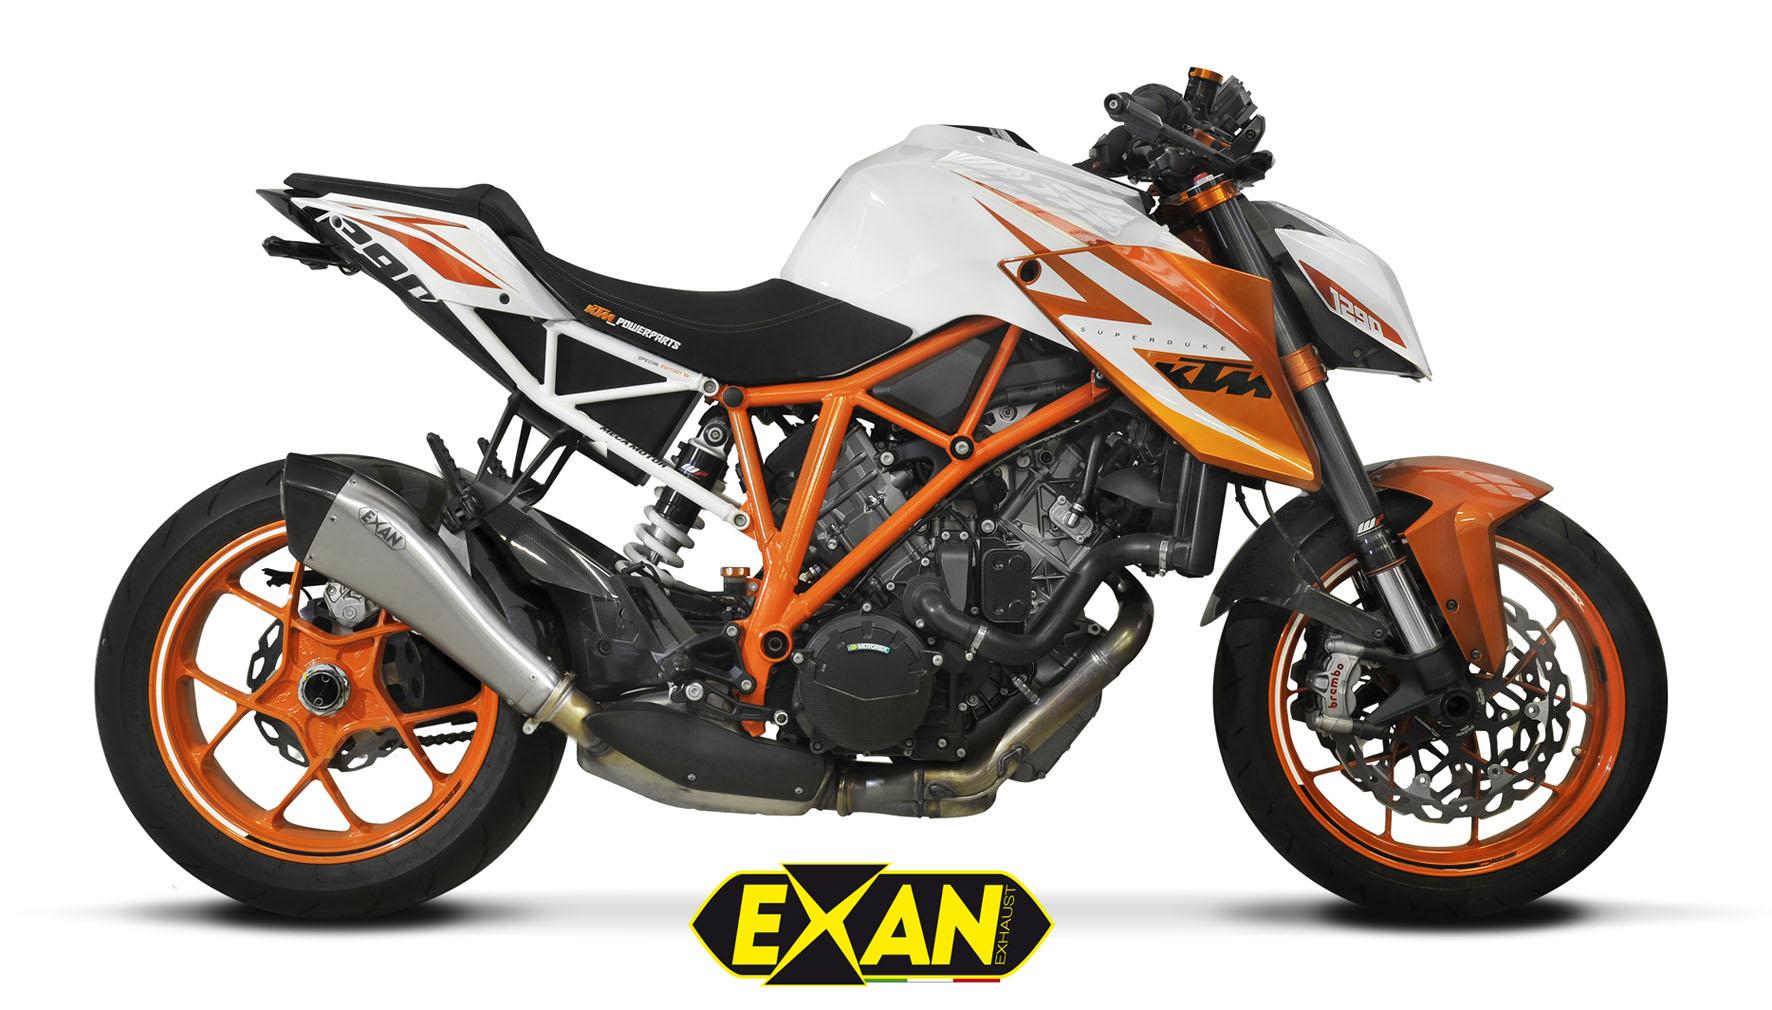 EXAN - KTM SUPERDUKE 1290R-X-Black Evo (Inox-Sat. Chiaro)